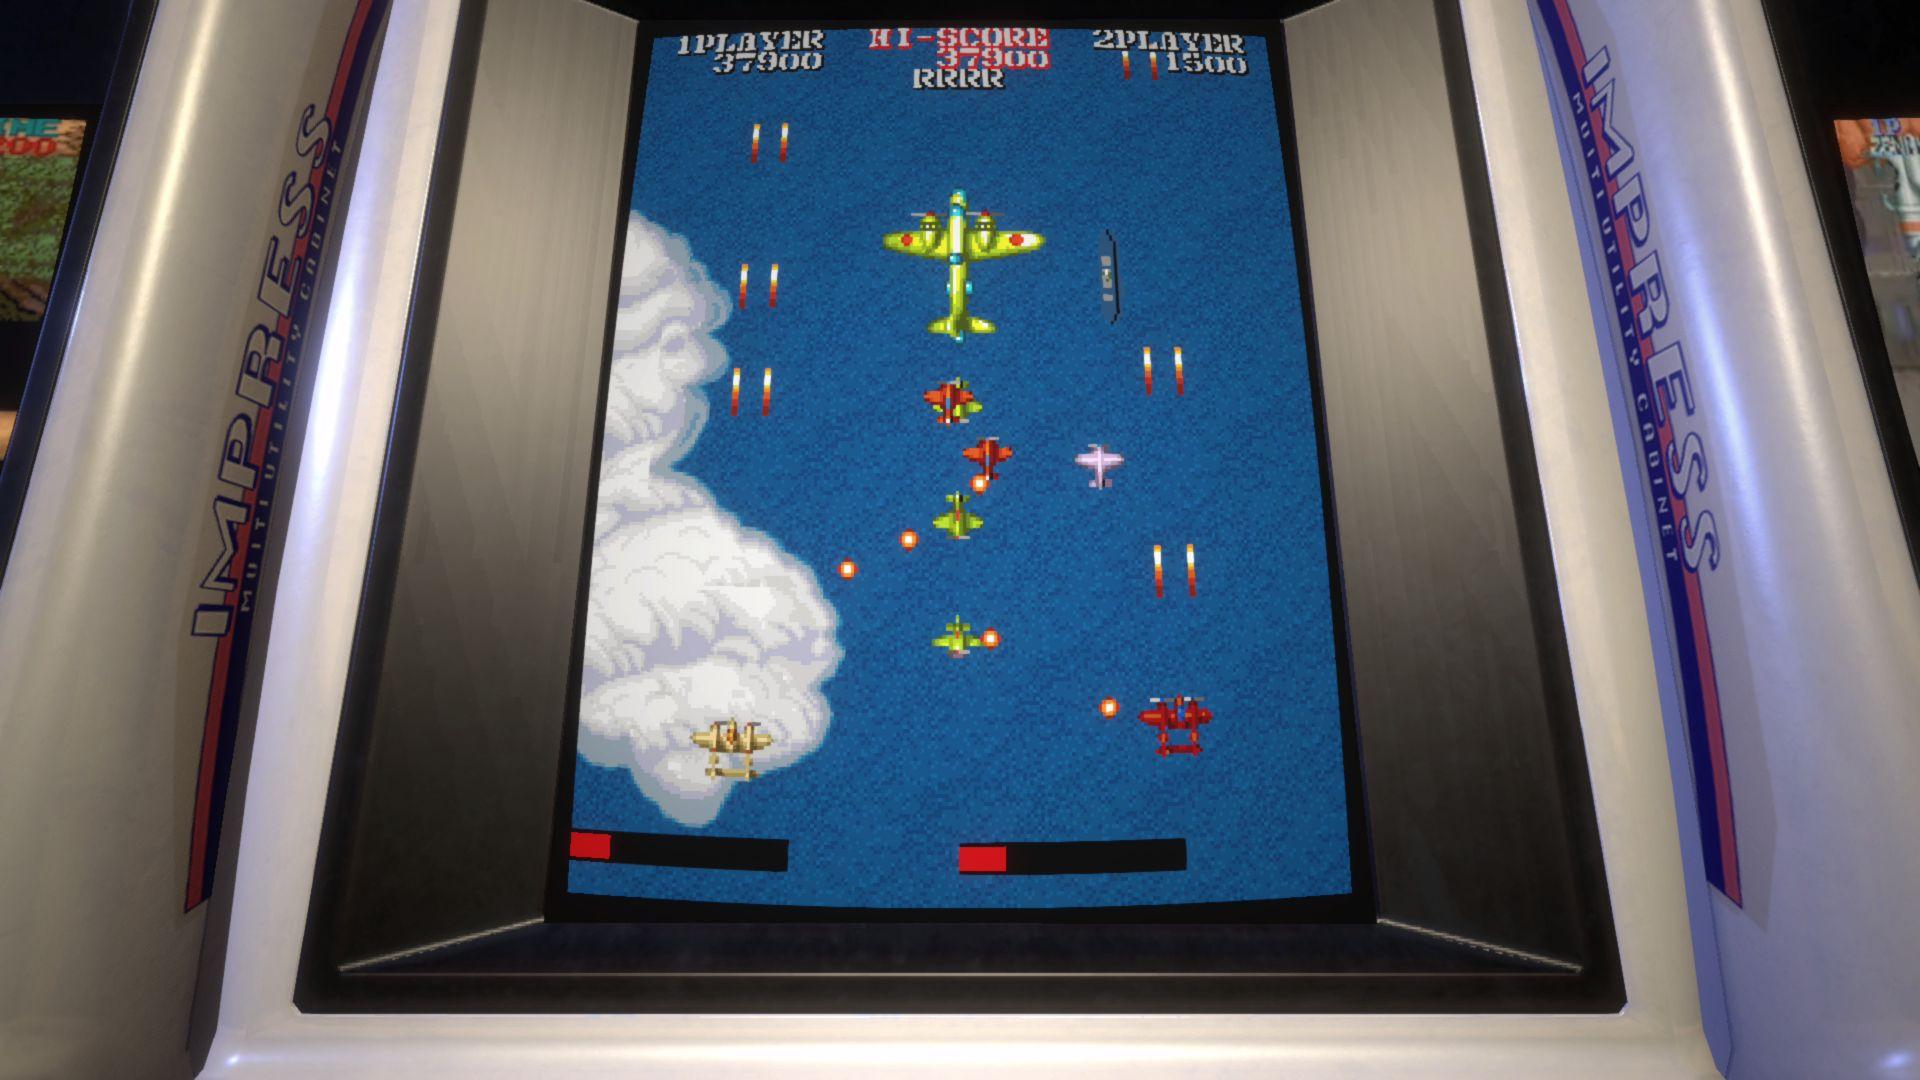 1943: The Battle of Midway (Capcom Arcade Stadium)